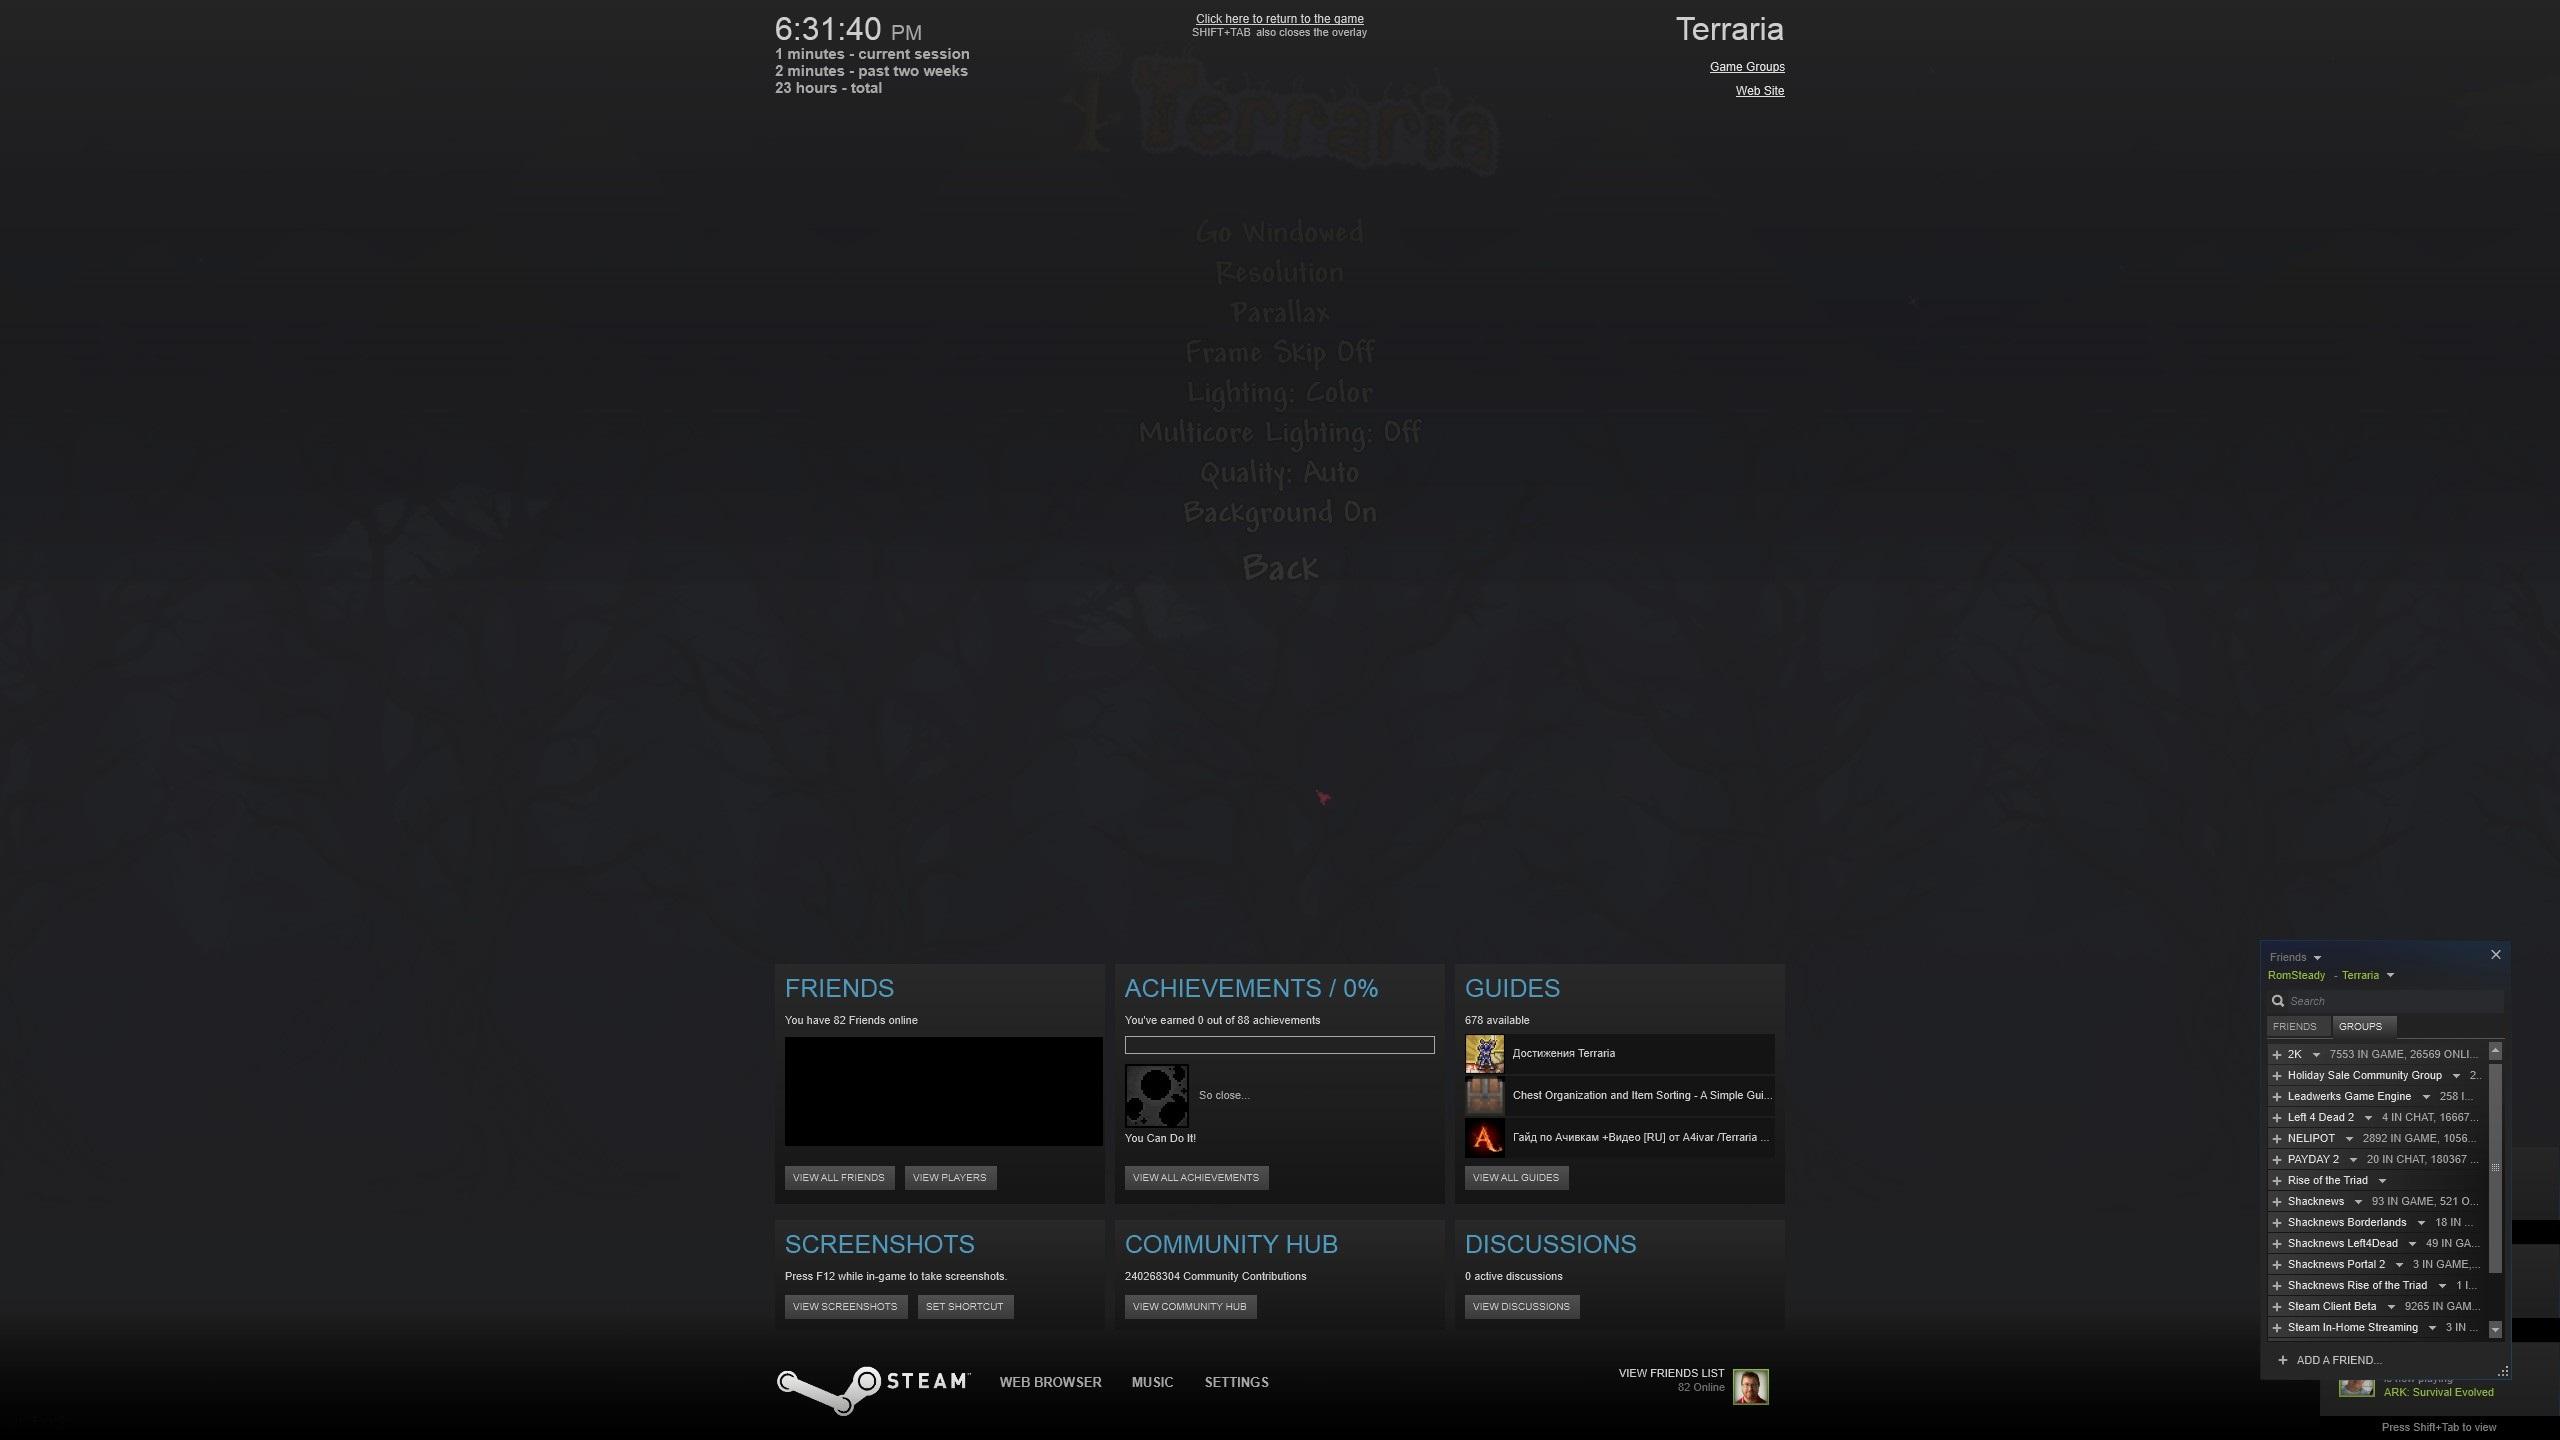 terraria patcher 1.3.0.8